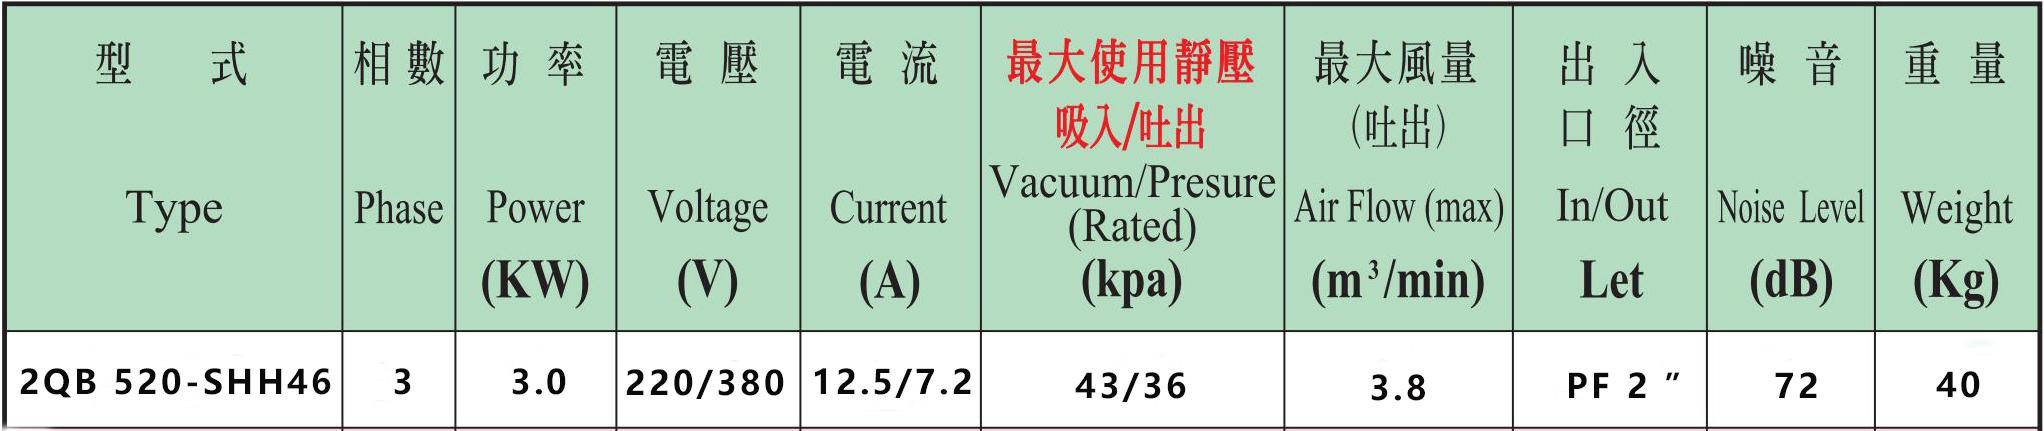 2QB 520-SHH46(3KW)高压风机性能参数